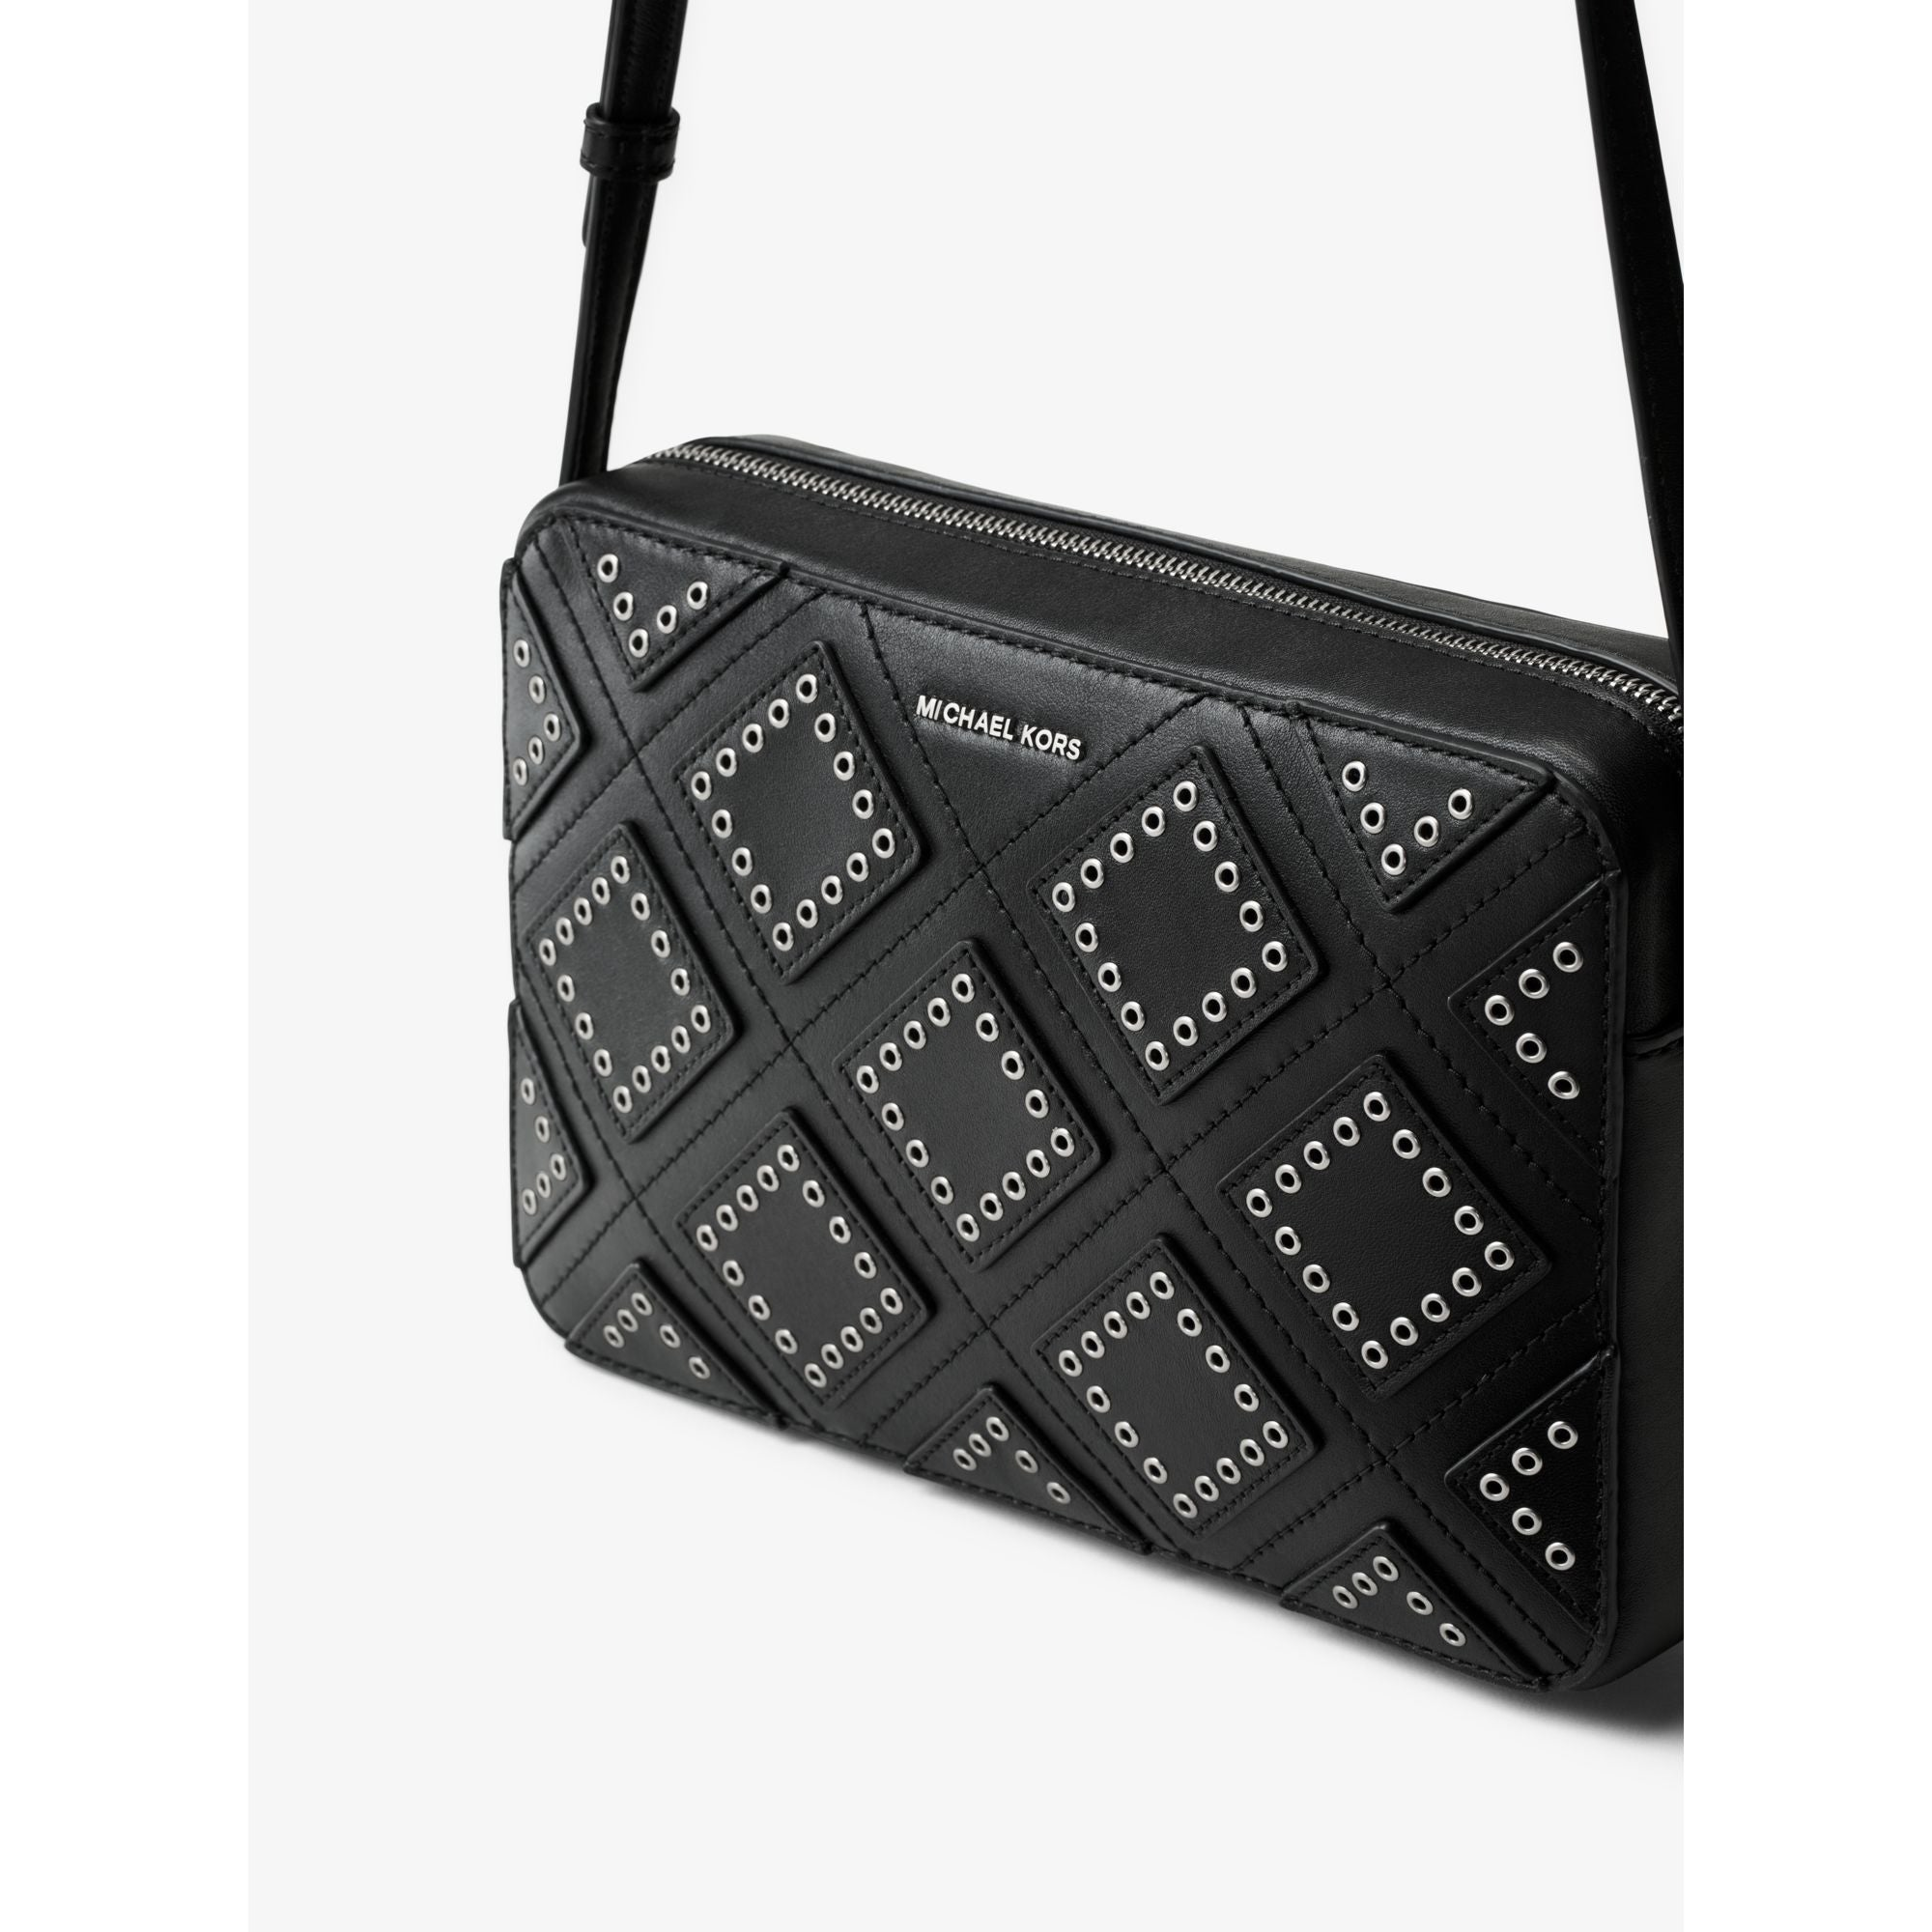 de6cff0018b6f2 Shop Michael Kors Black Diamond Grommet Jet Set Travel Large East West Crossbody  Handbag - Free Shipping Today - Overstock - 13344143